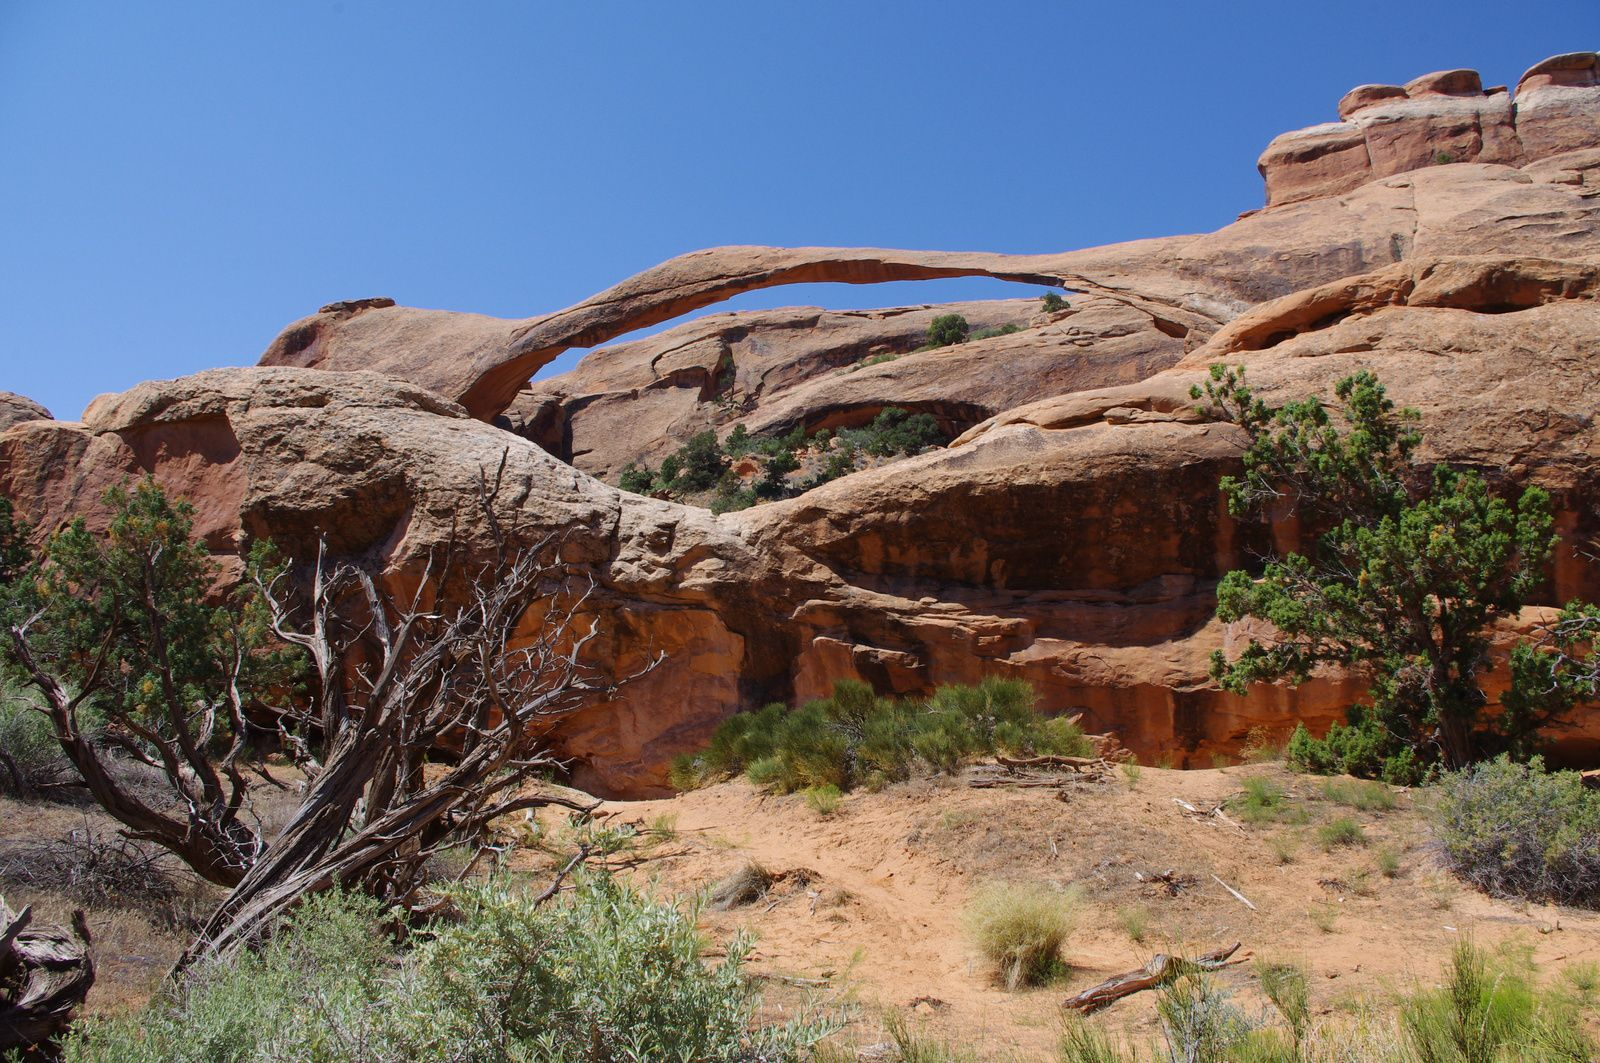 USA Road Trip - Jour 14/25 - Arches National Park